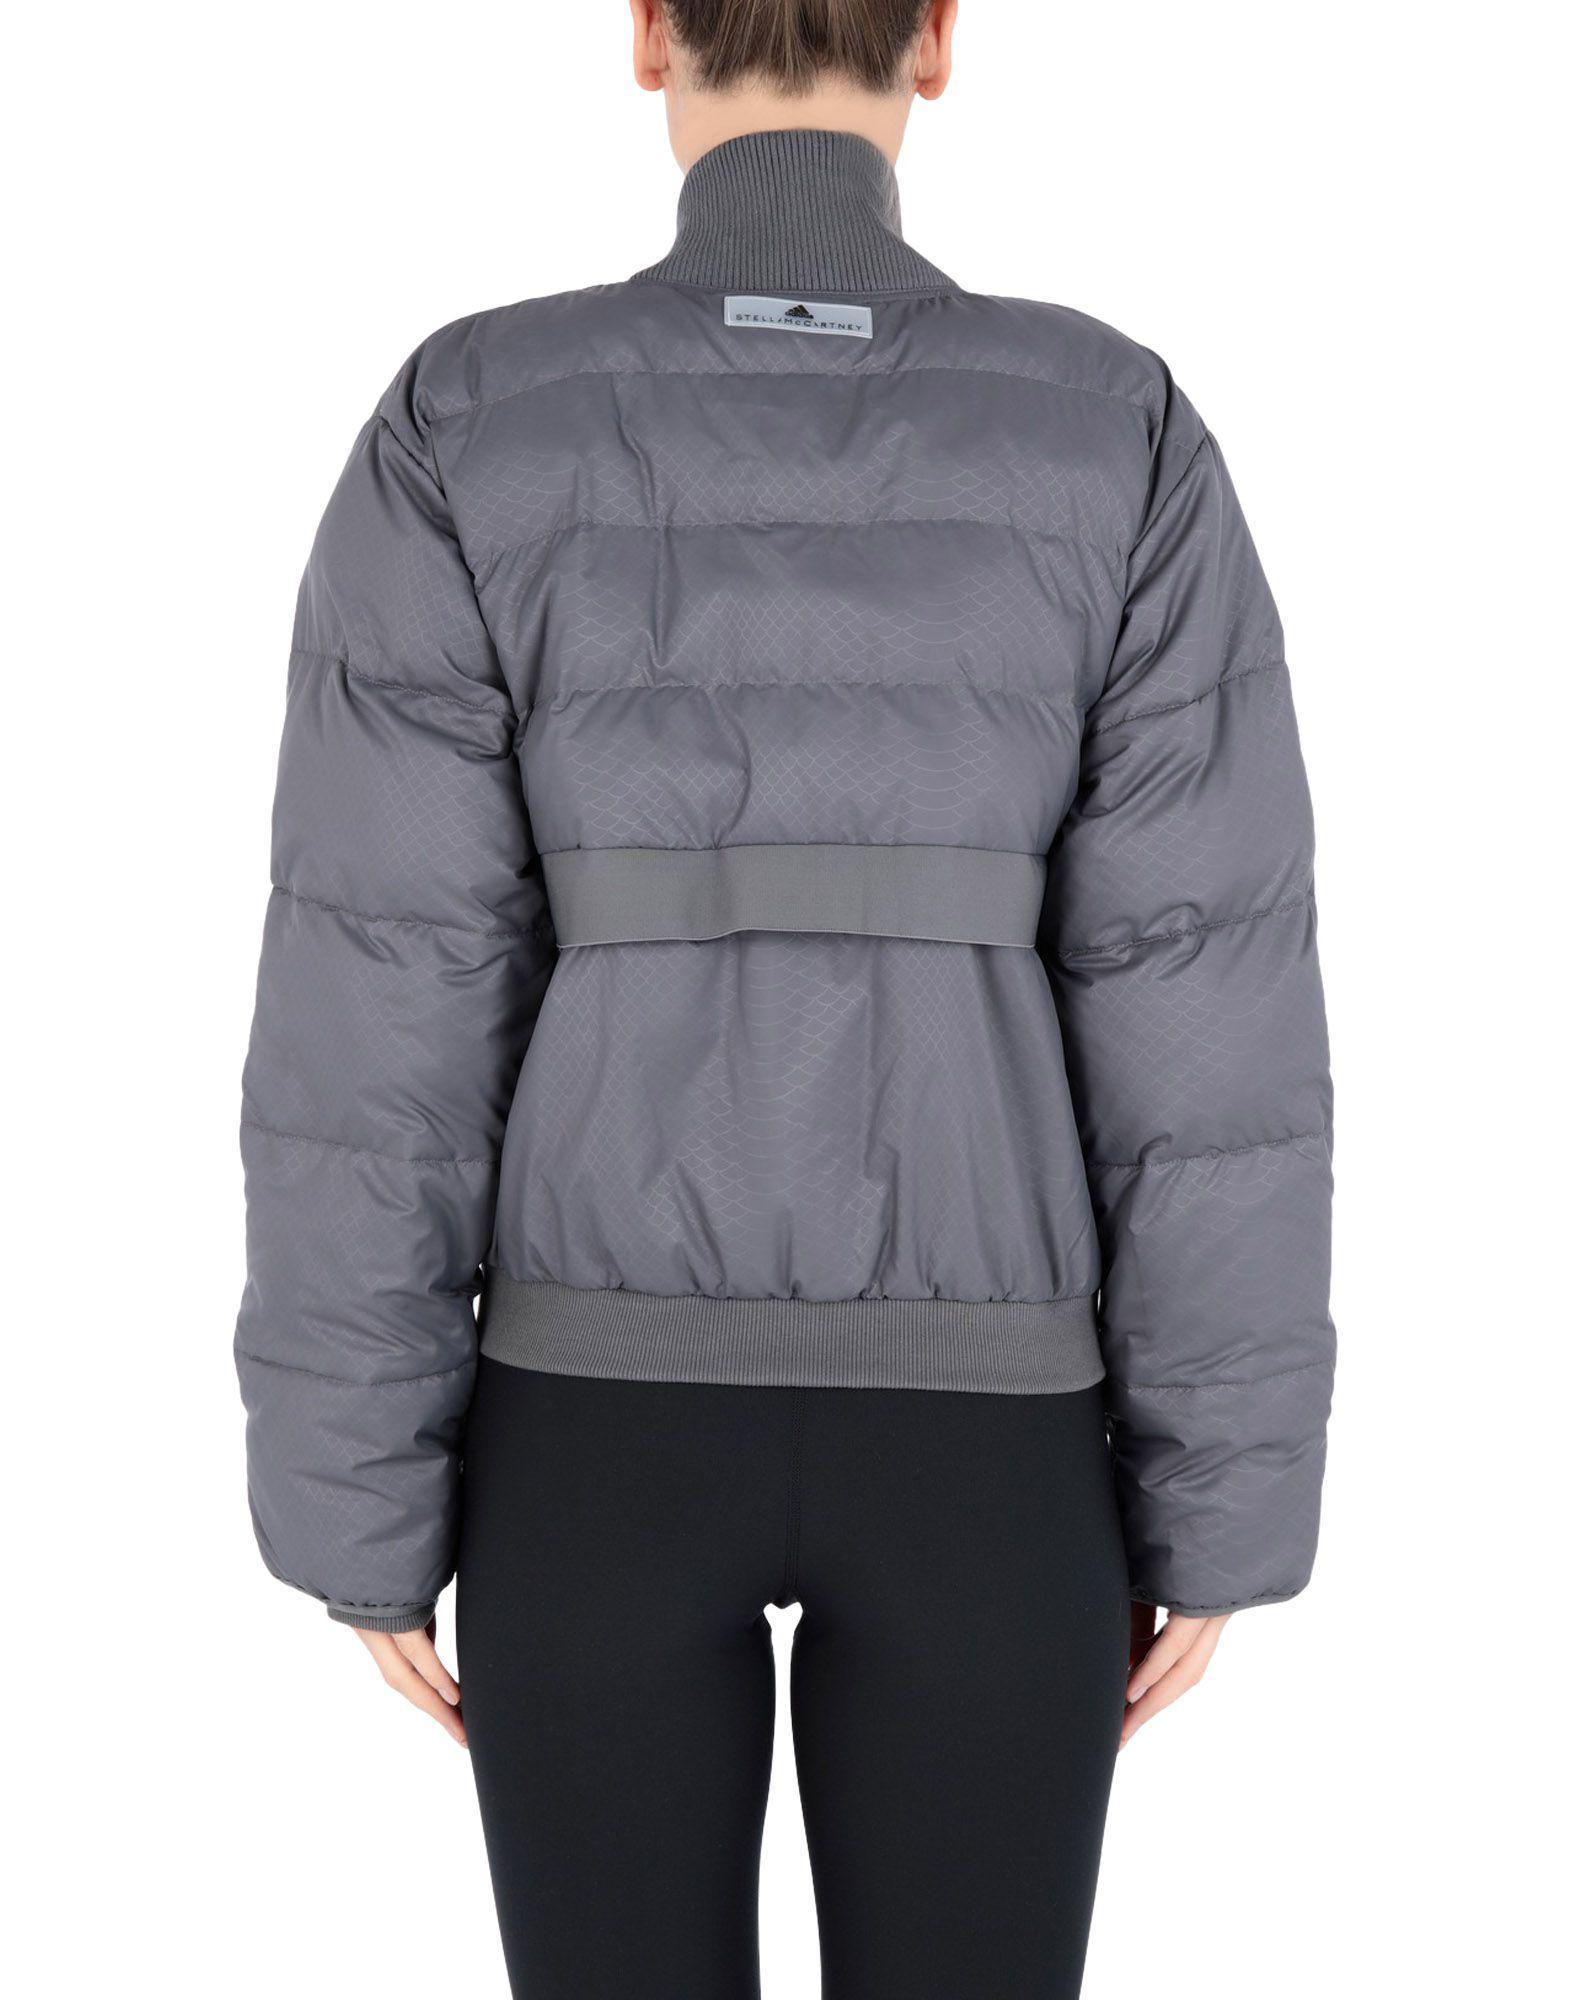 5424c864156f adidas By Stella McCartney Synthetic Down Jacket in Gray - Lyst